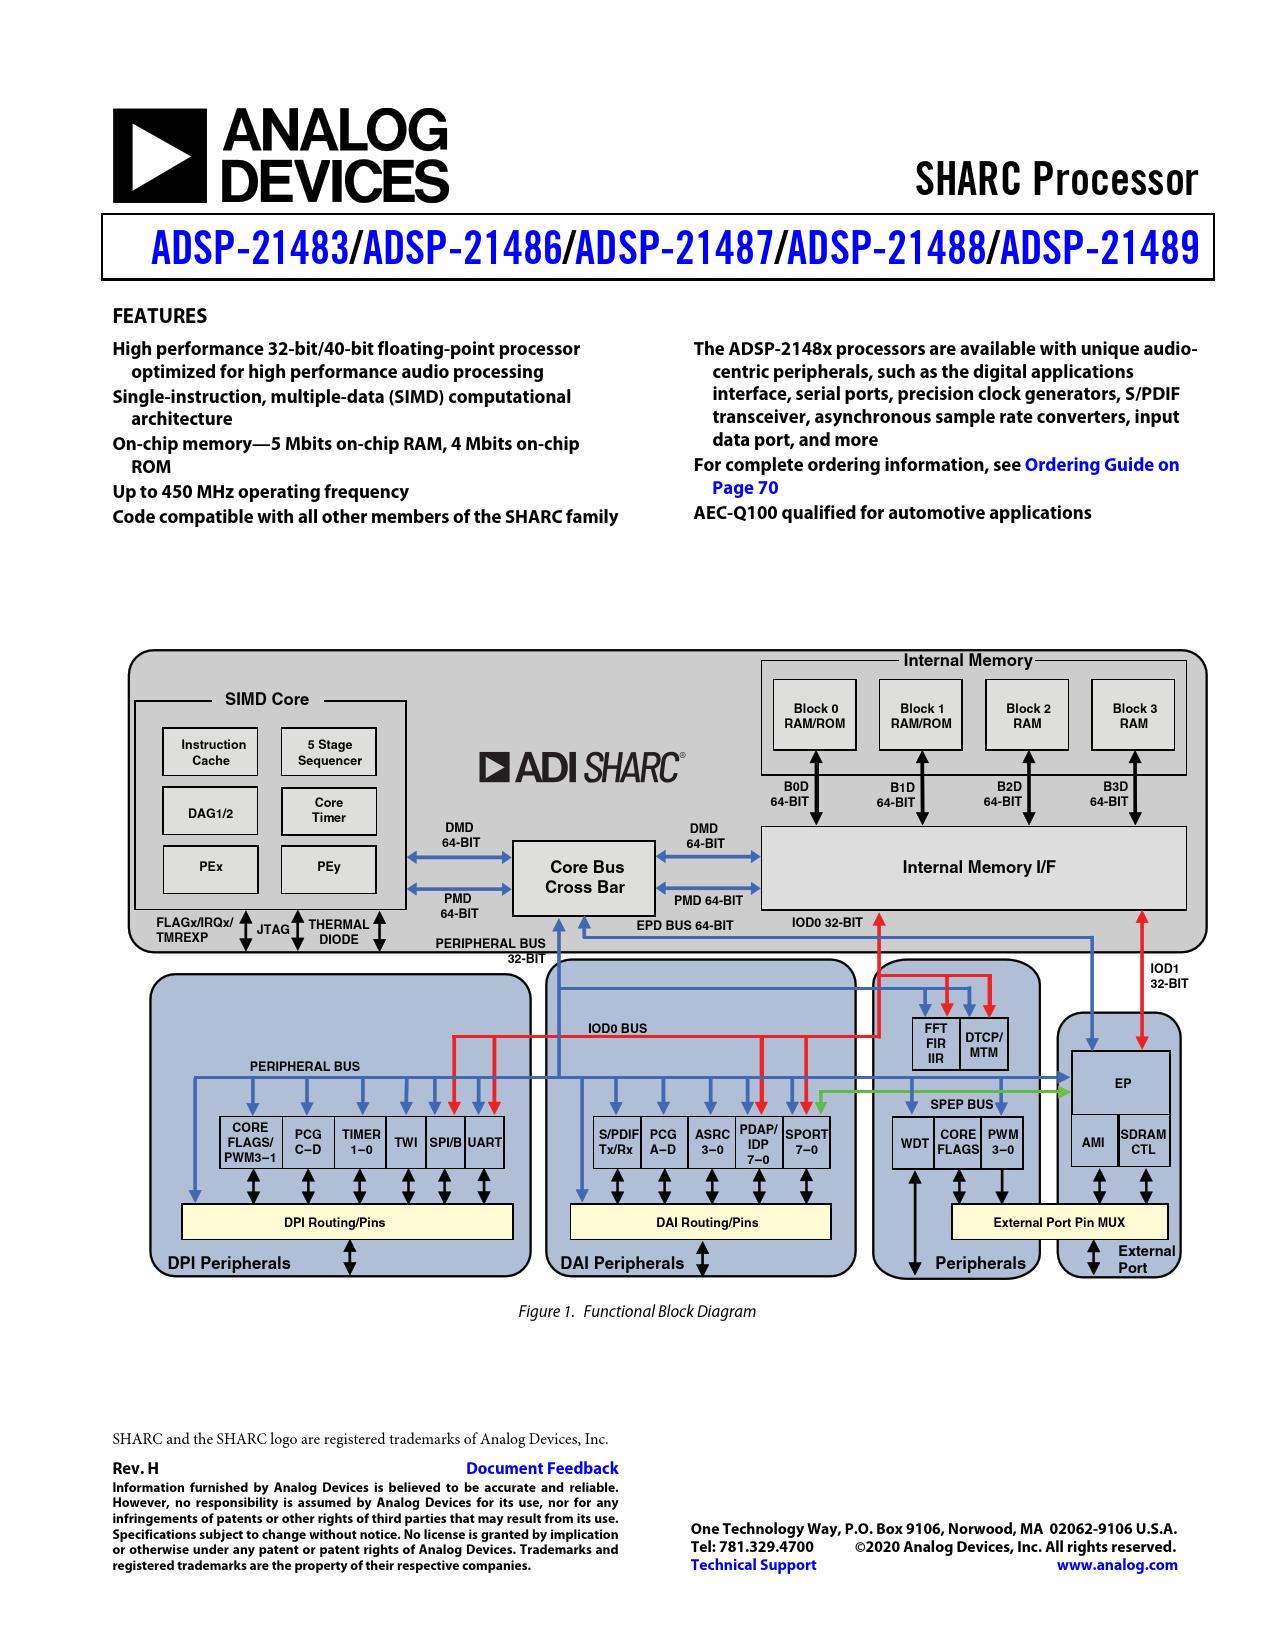 Datasheet ADSP-21483, ADSP-21486, ADSP-21487, ADSP-21488, ADSP-21489 Analog Devices, Версия: H